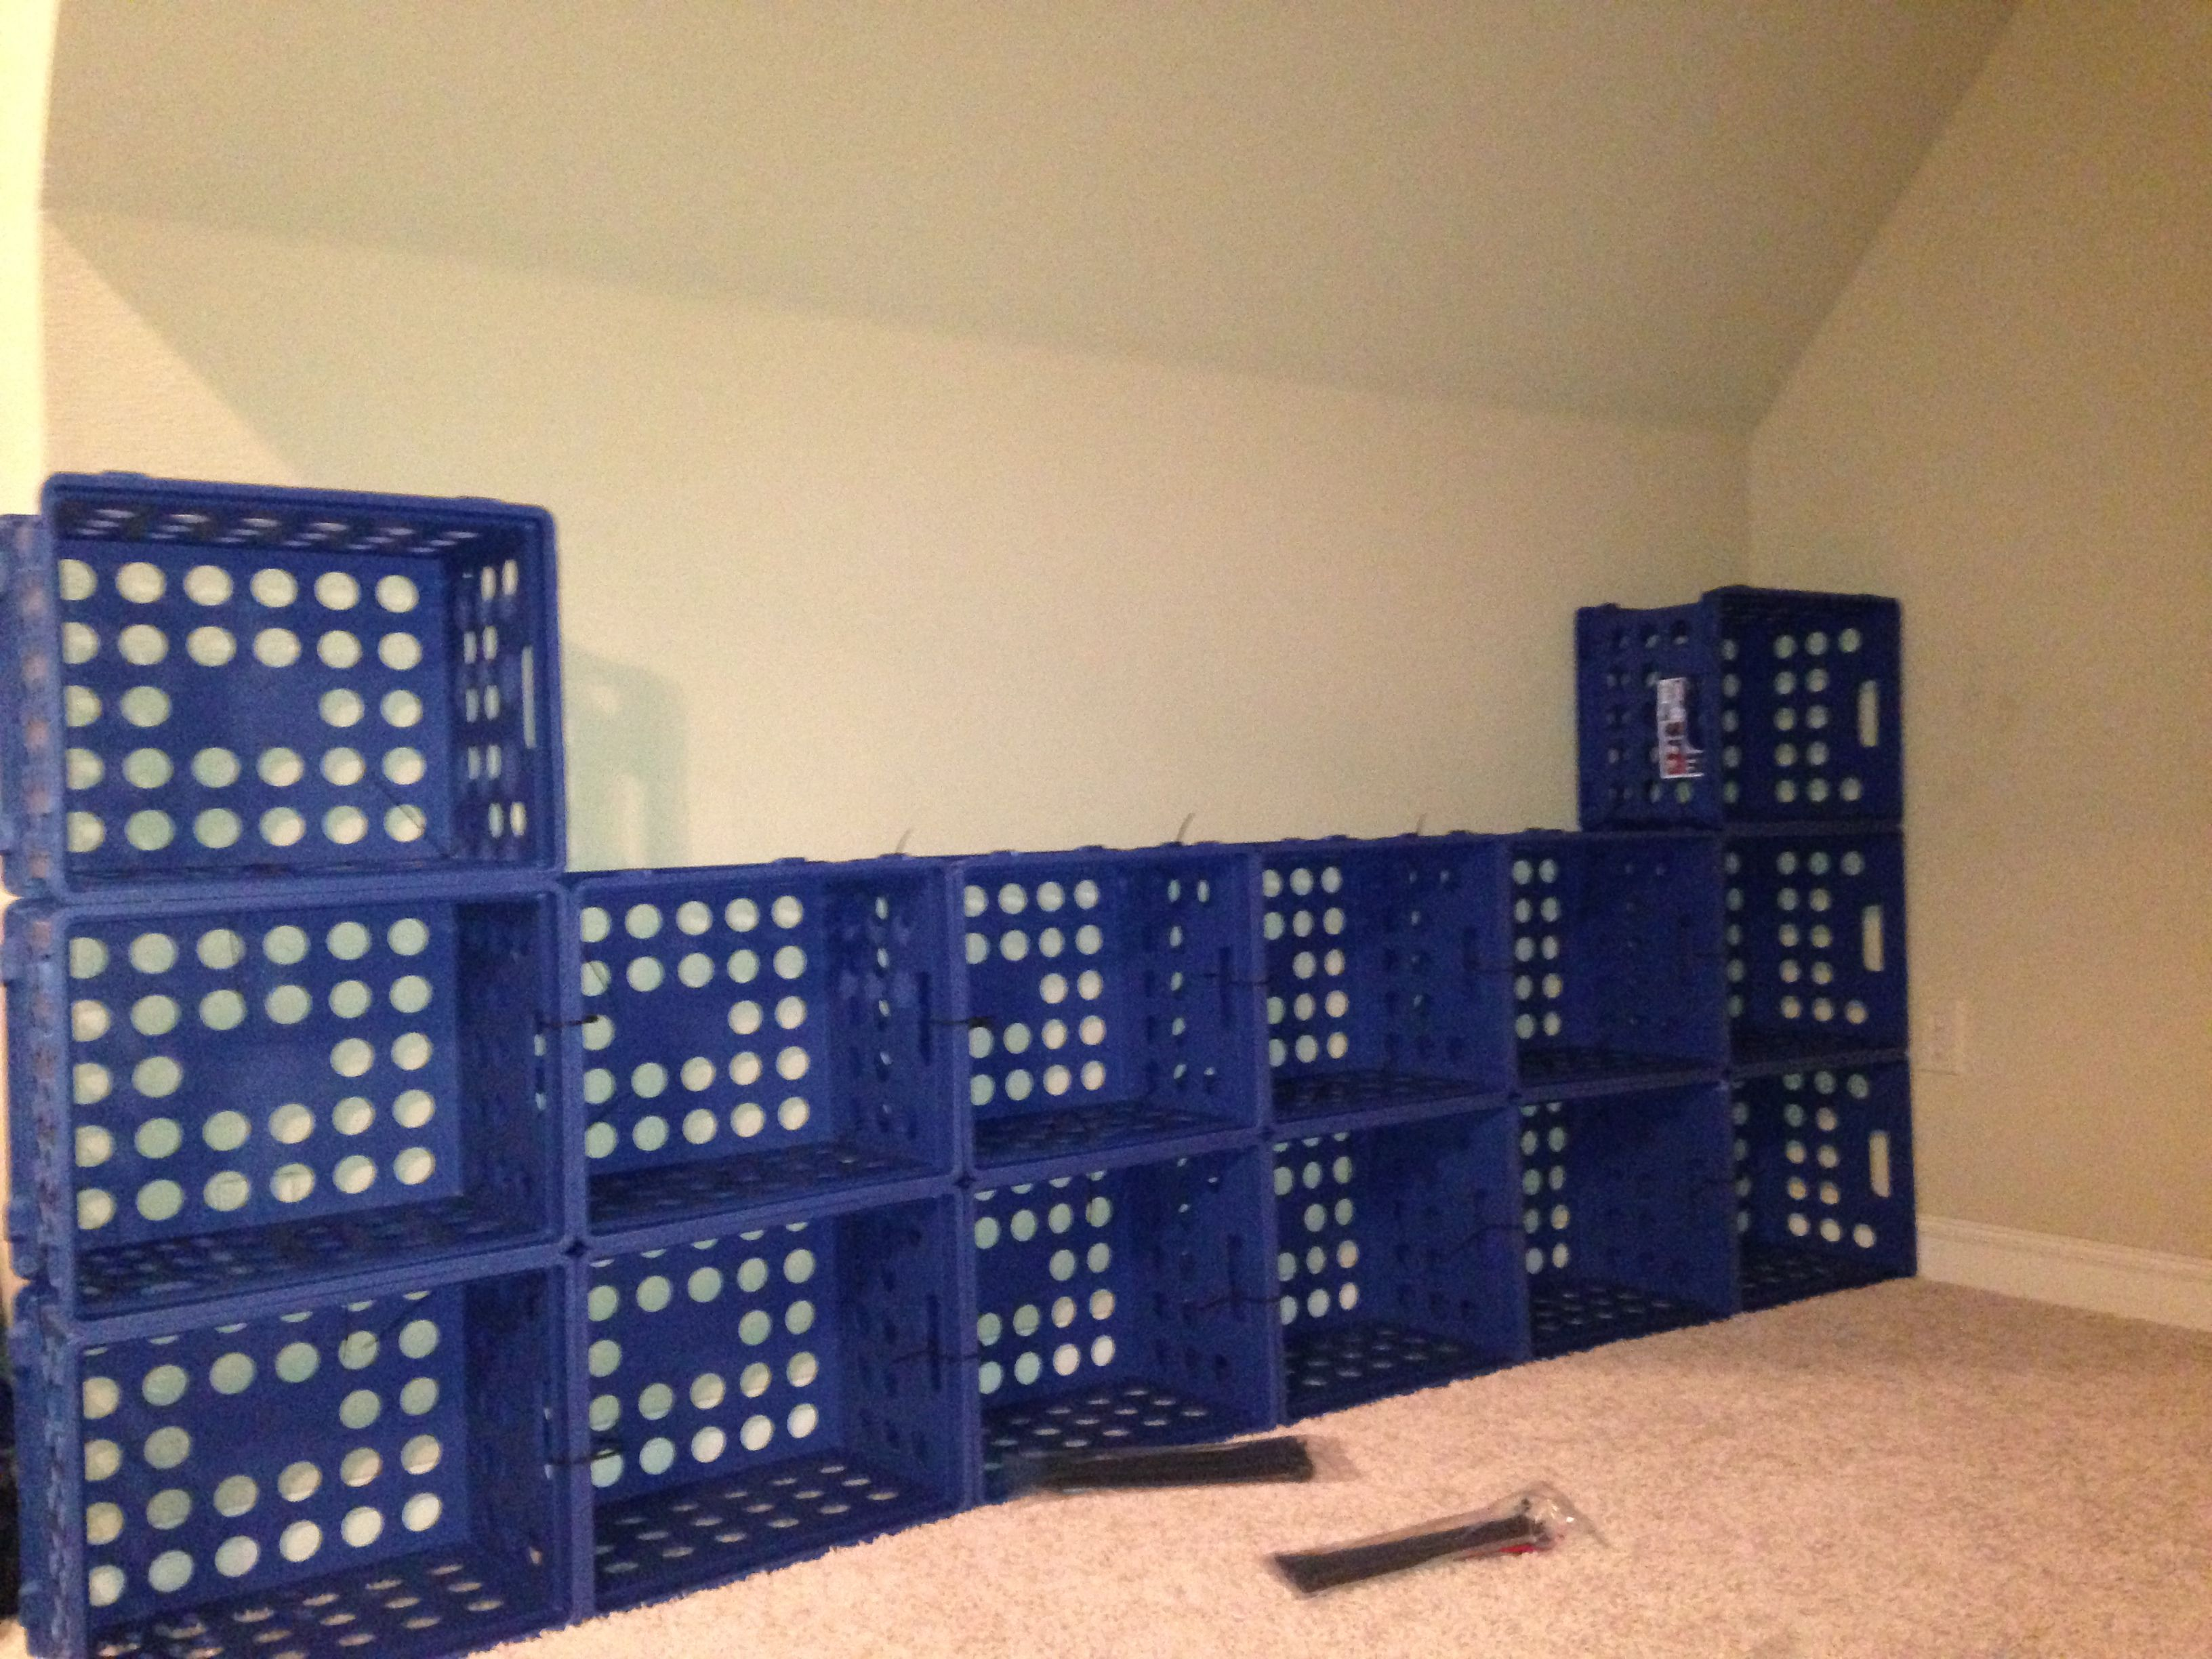 Zip Tie Plastic Crates Together For Storage Using Mine To Build A Closet Milk Crate Storage Toy Room Organization Dollar Store Diy Organization